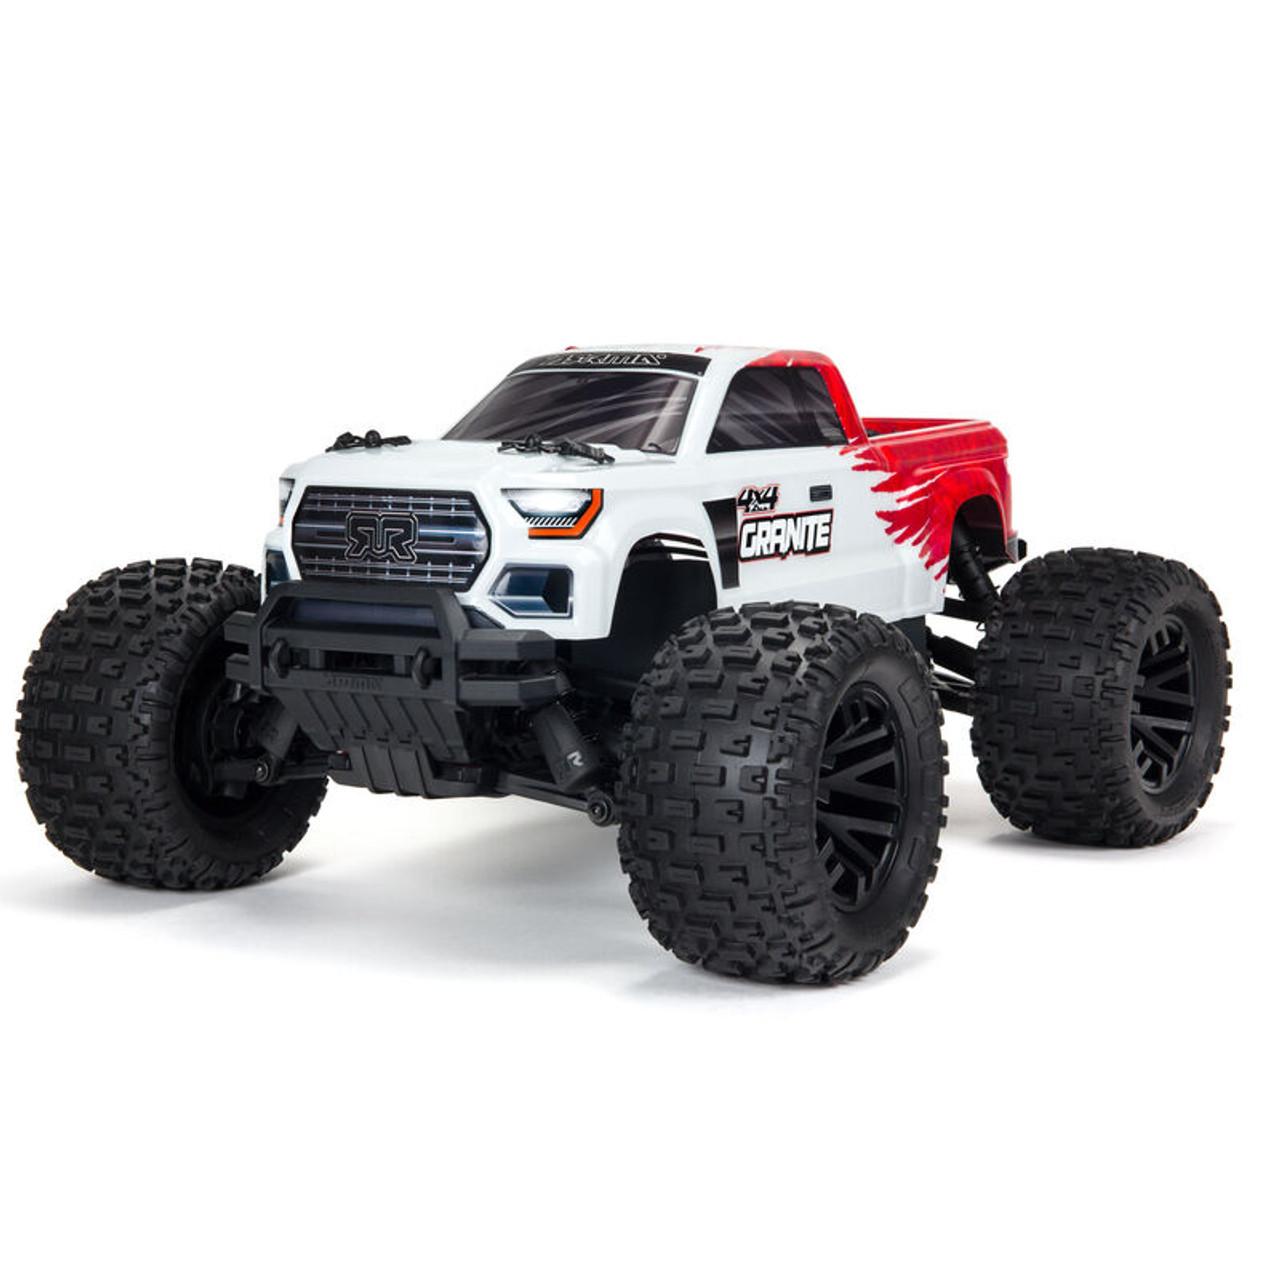 Arrma Granite 4x4 V3 550 Mega RTR Monster Truck (Red) w/ Spektrum SLT3 2.4GHz Radio